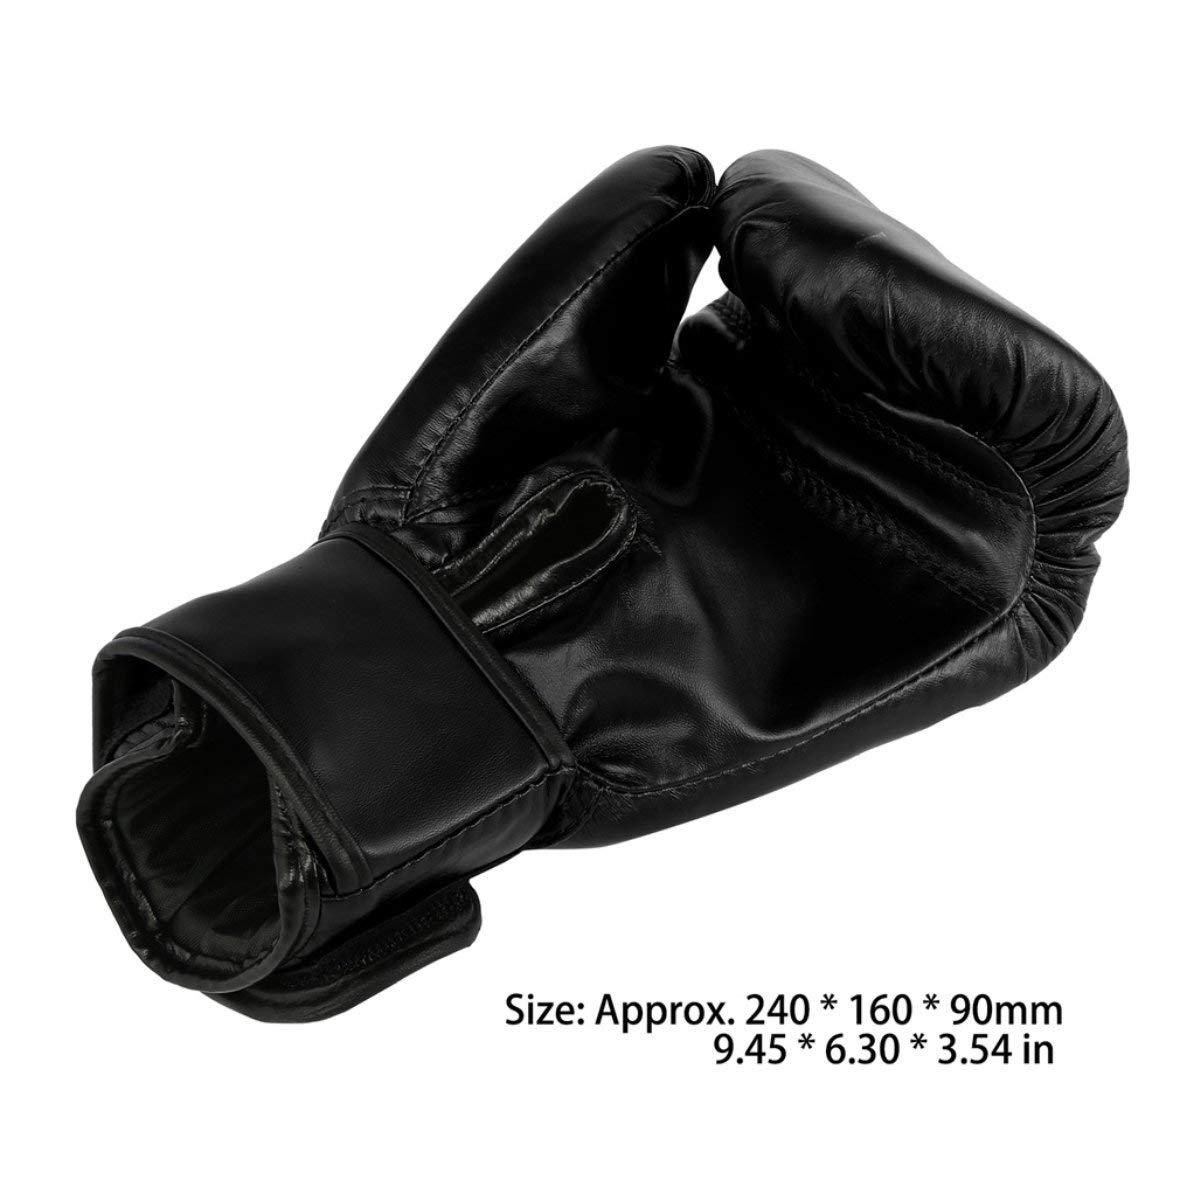 Schwarz Lesiey Red /& Black Adult Boxhandschuhe Professional Sandsack Liner Handschuhe Kickboxhandschuhe Faustkampf M/änner Frauen Training Fighting Tool